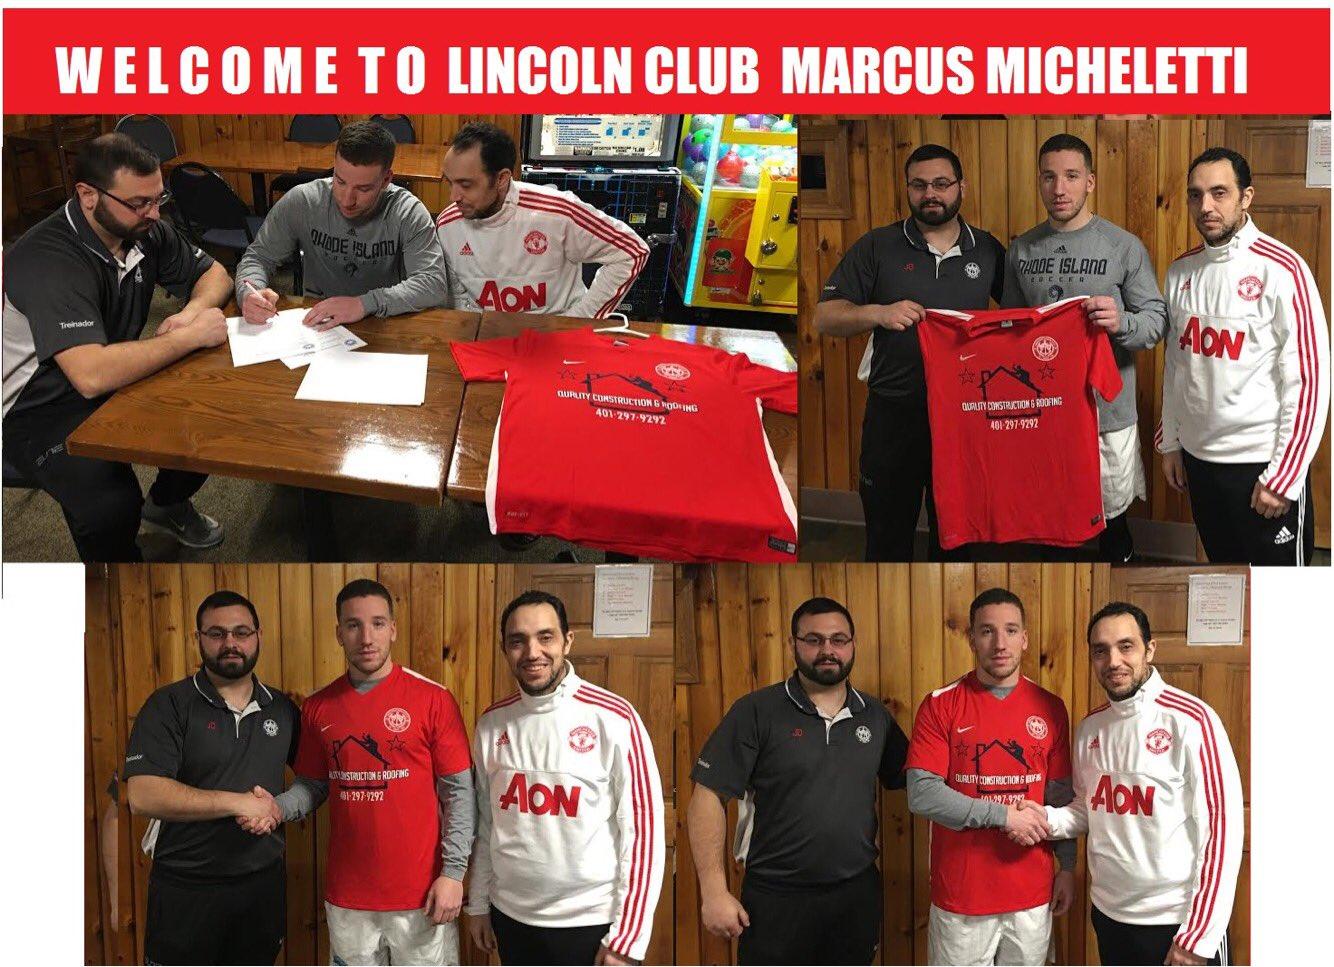 Lincoln Club Futebol on Twitter: